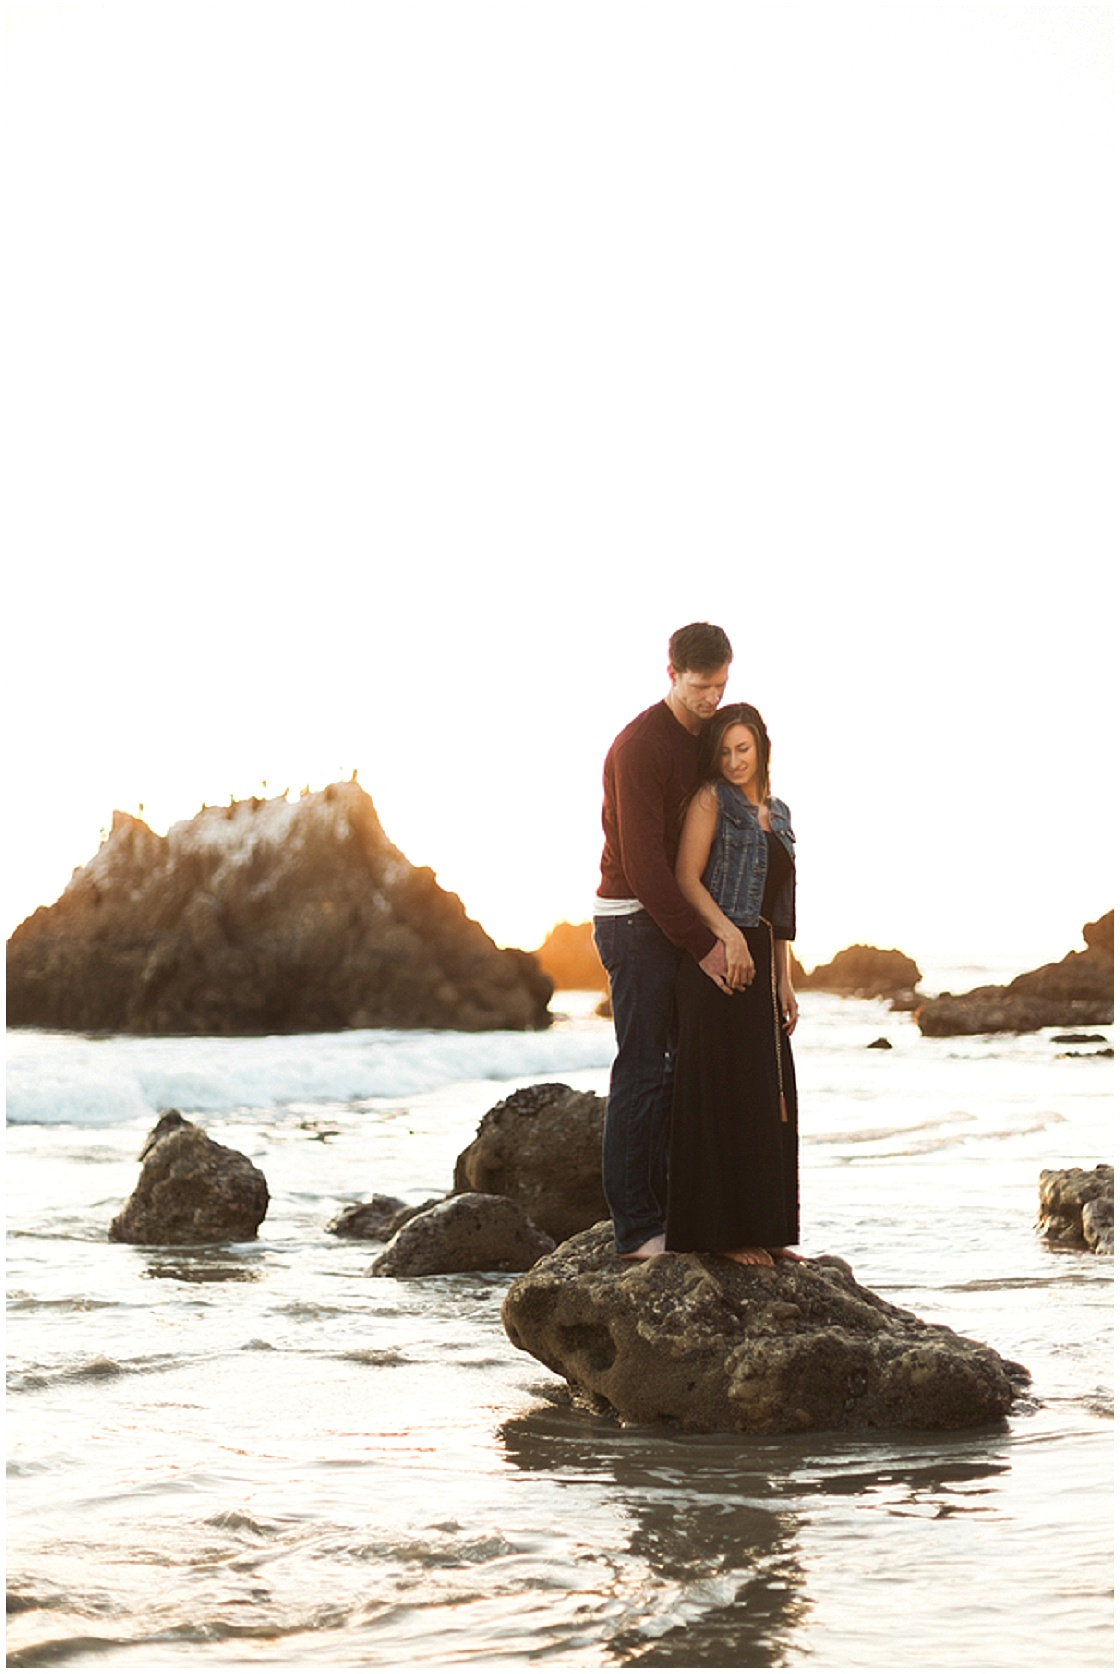 California Engagement Session | Ryanne Bee Photography | Wedding Blog | Wedding Inspiration | Joy Wed blog | http://www.joy-wed.com